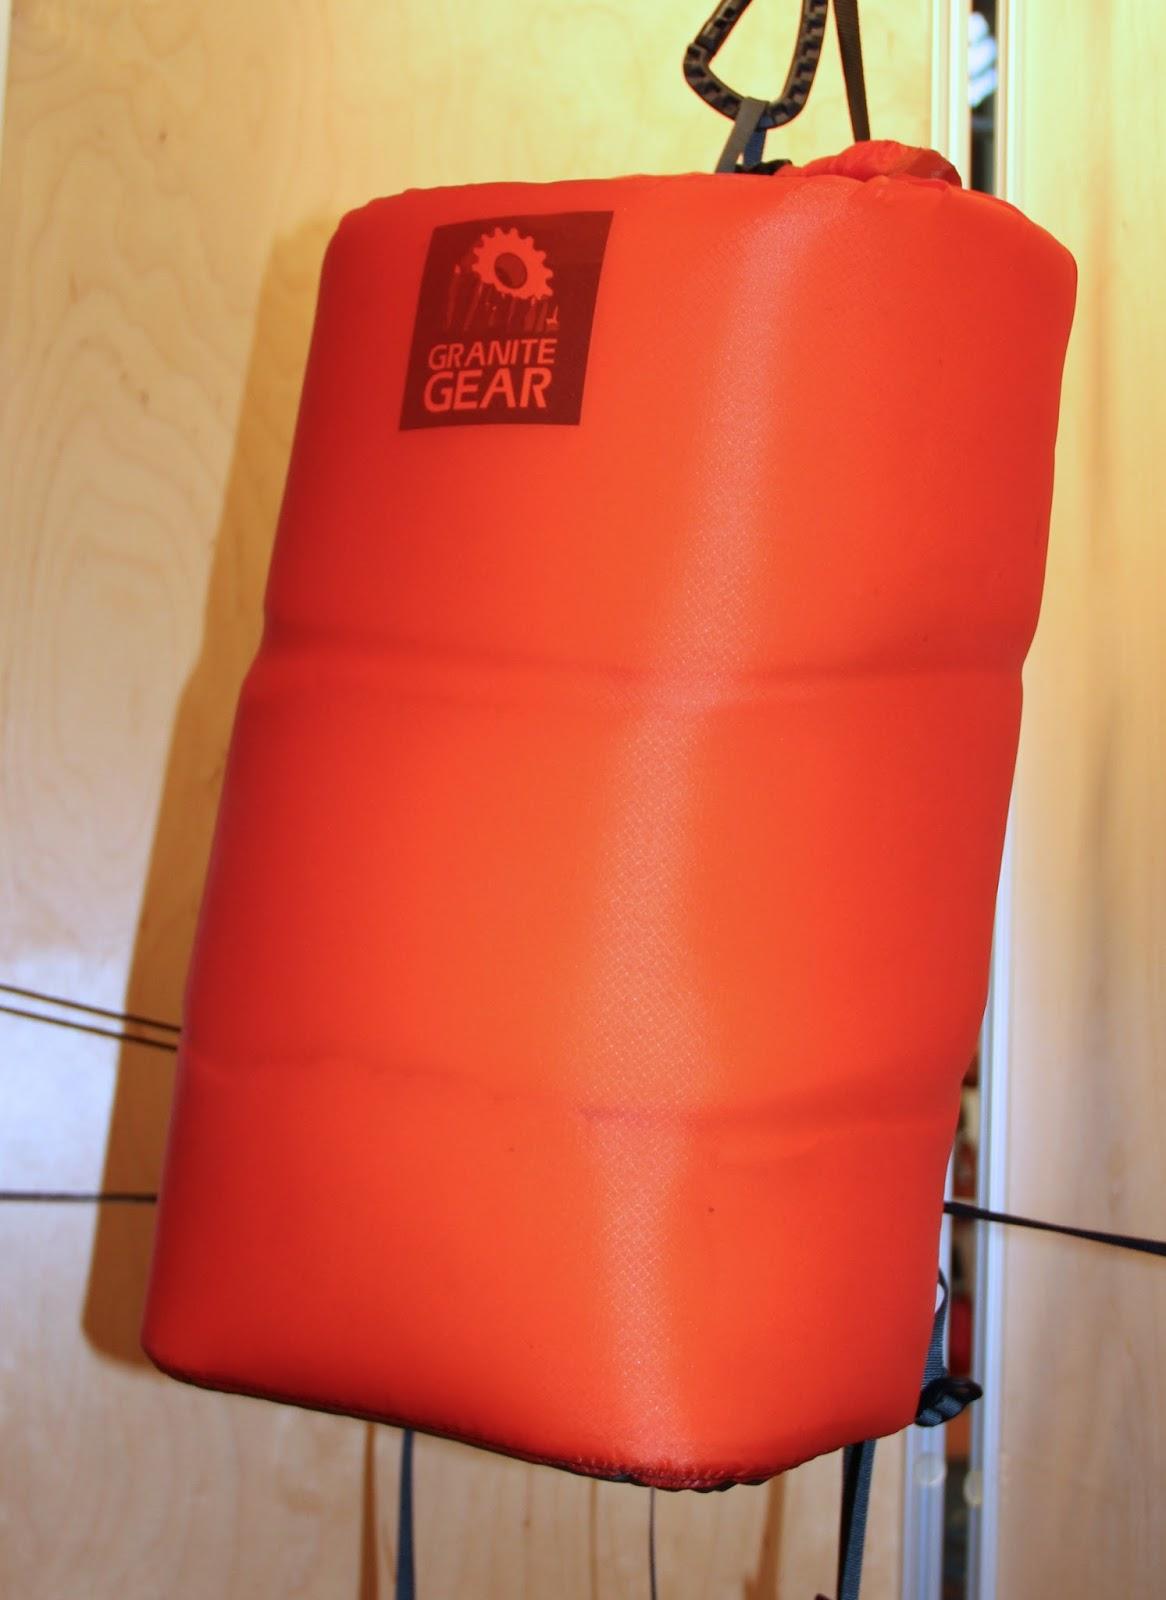 a592cba21 GRANITE GEAR S/S 2014 New Backpacks